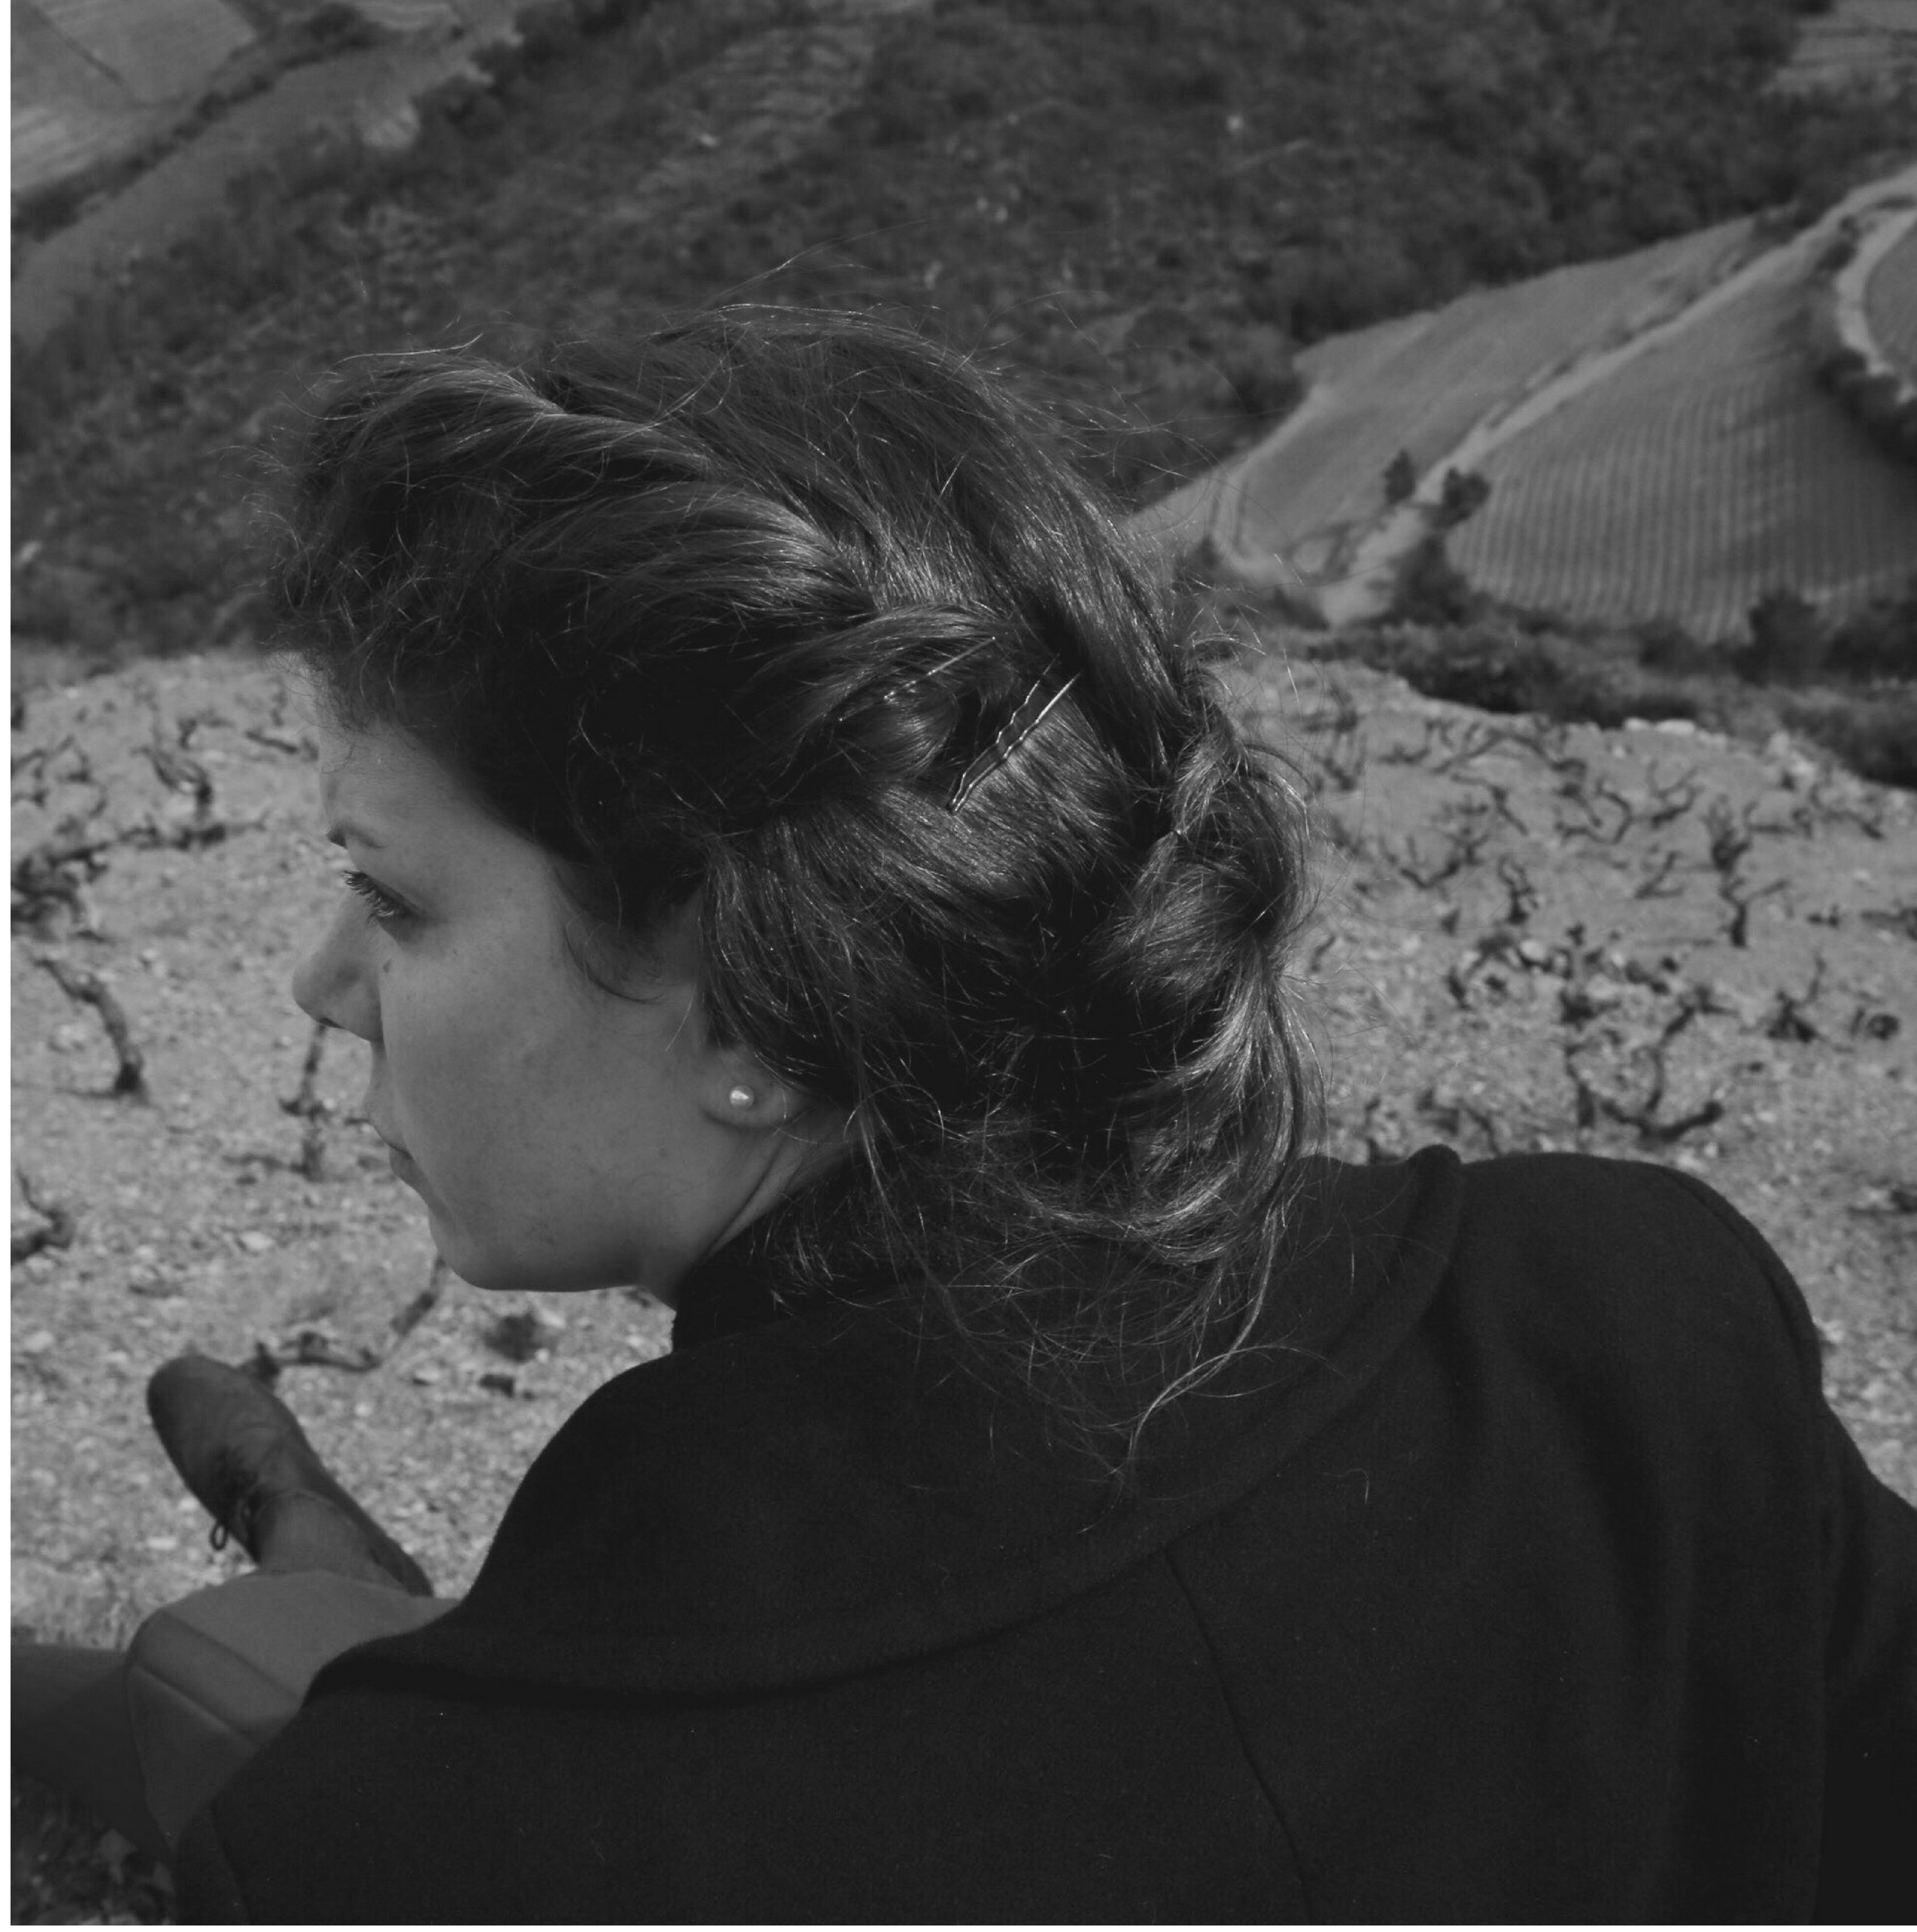 Marta Reggio